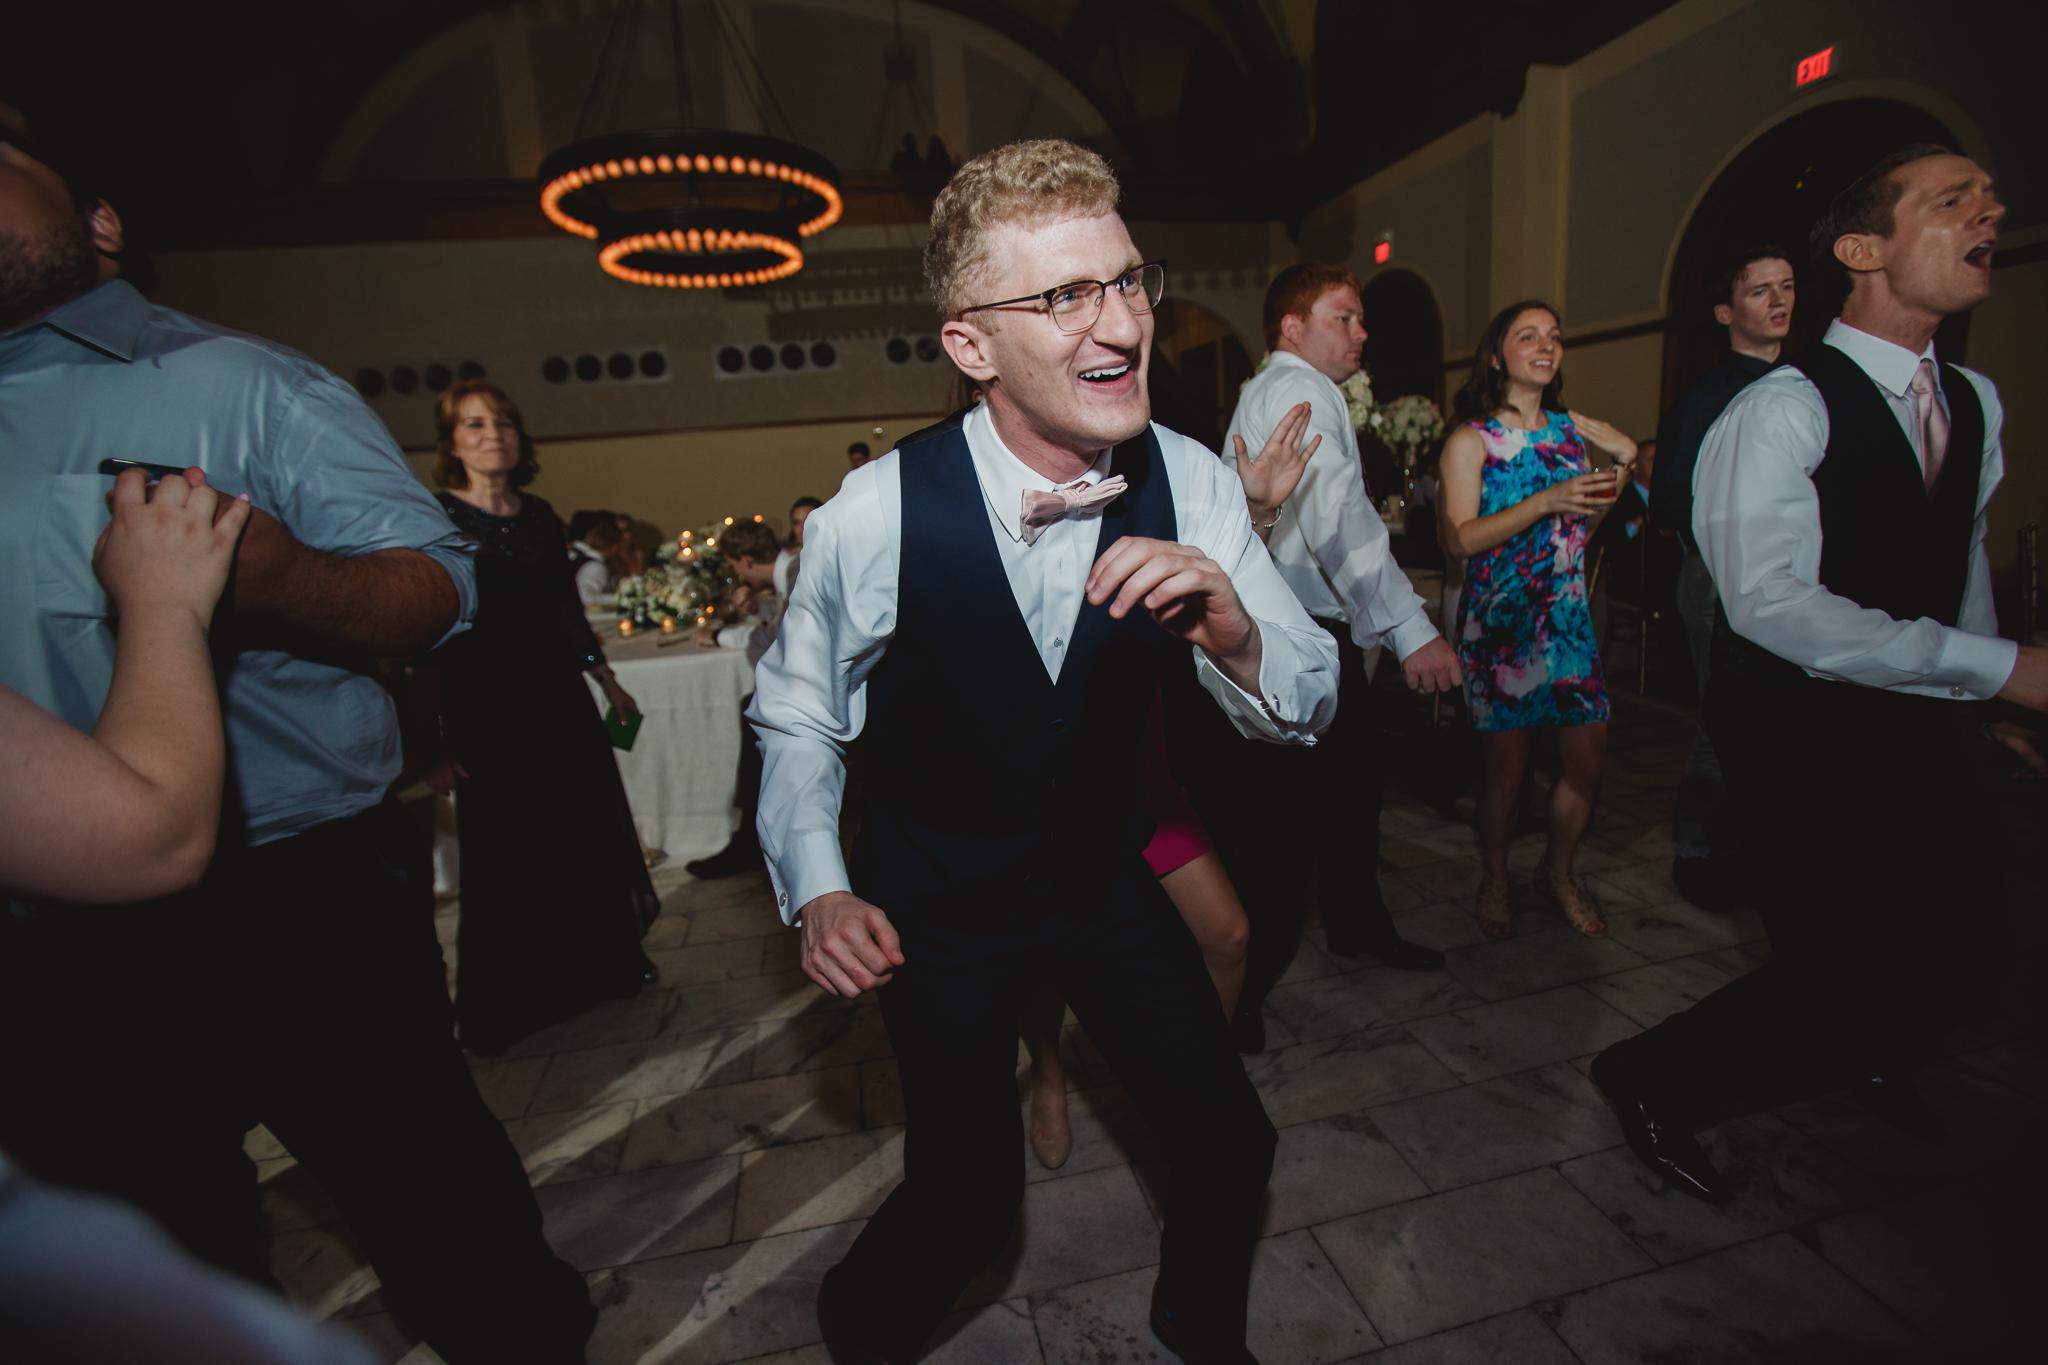 Michael and Kelly - the ashton depot - wedding DFW - wedding photographer- elizalde photography (135 of 150).jpg